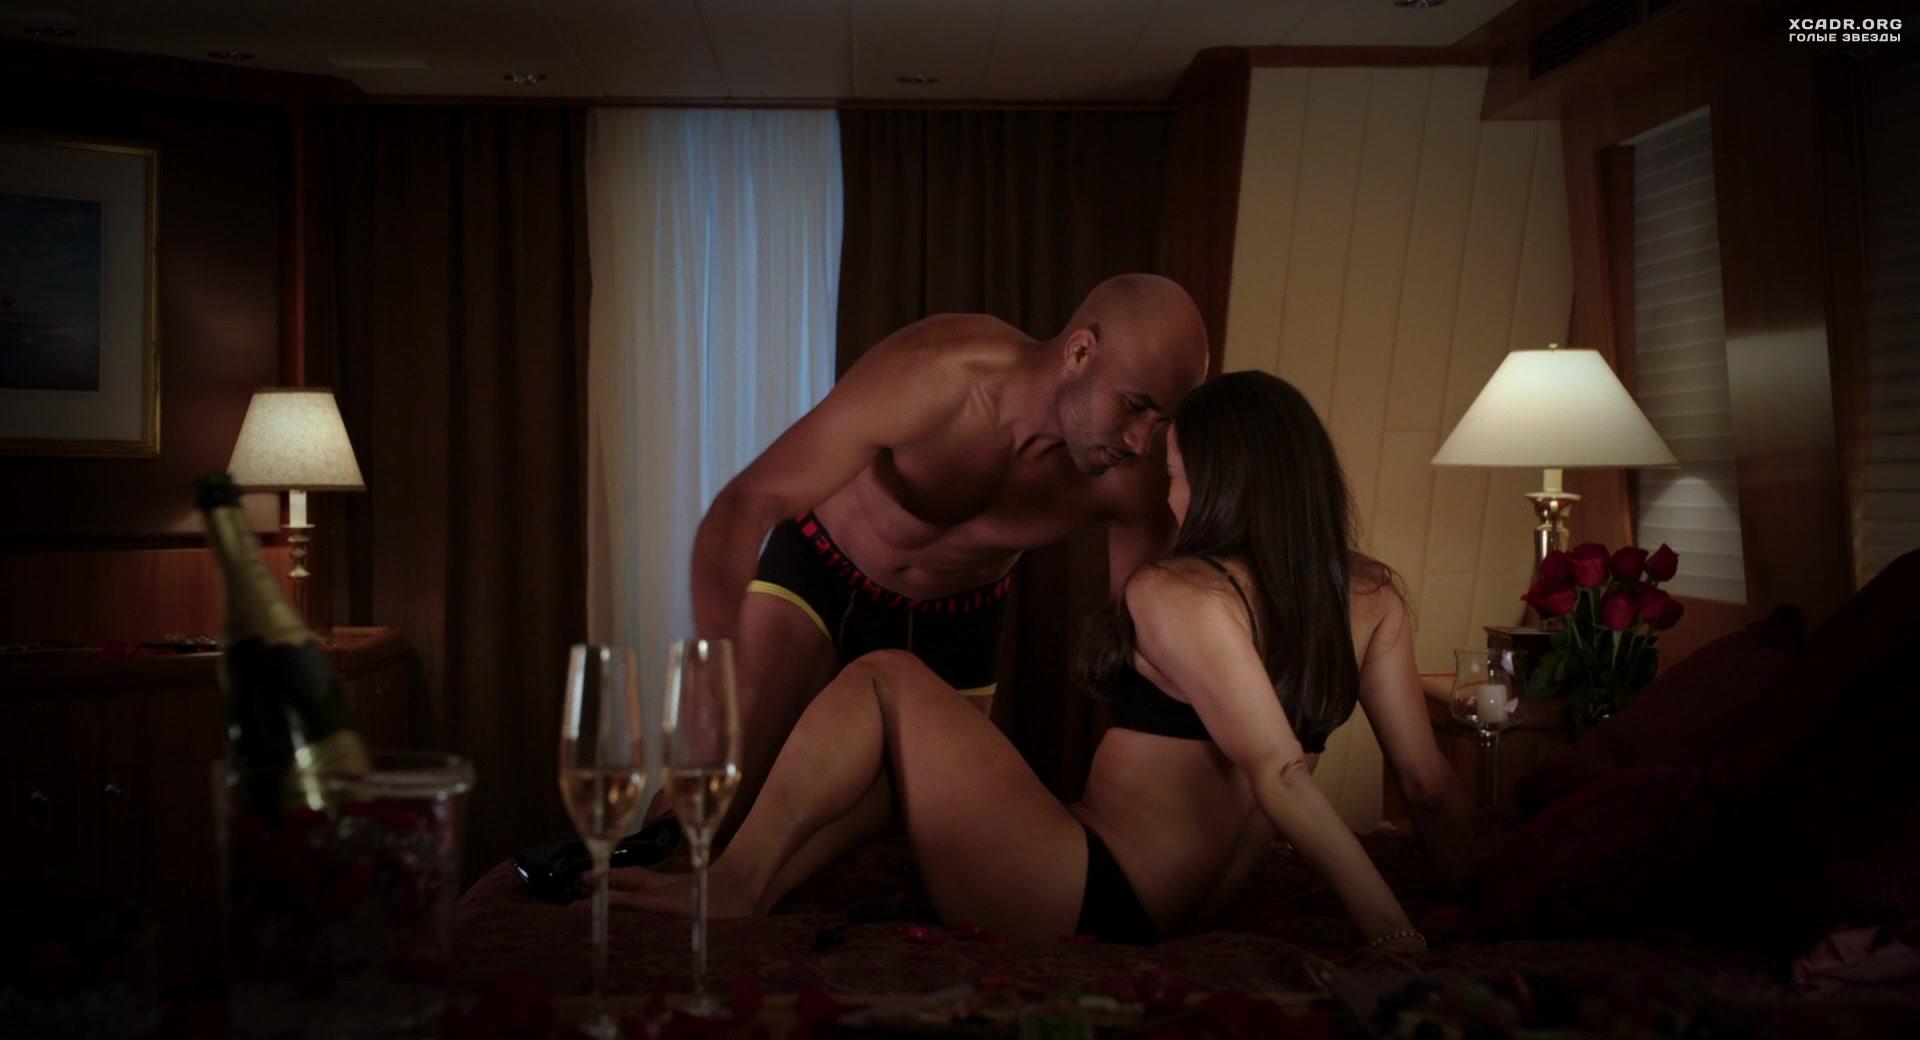 Paula patton porn picture online, justin kirk sex